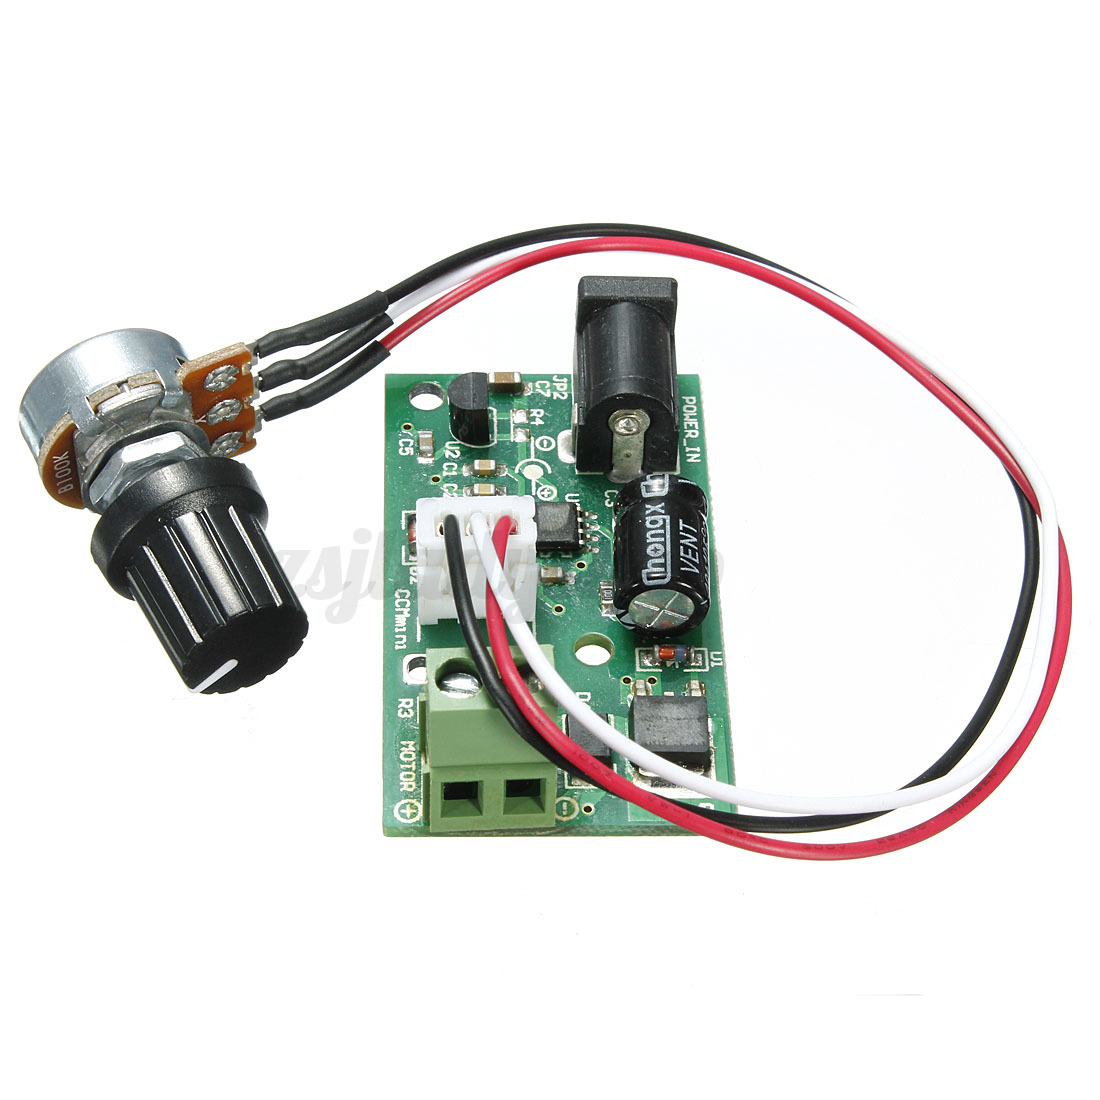 6v 28v 3a Dc Pwm Motor Speed Regulator Controller Switch